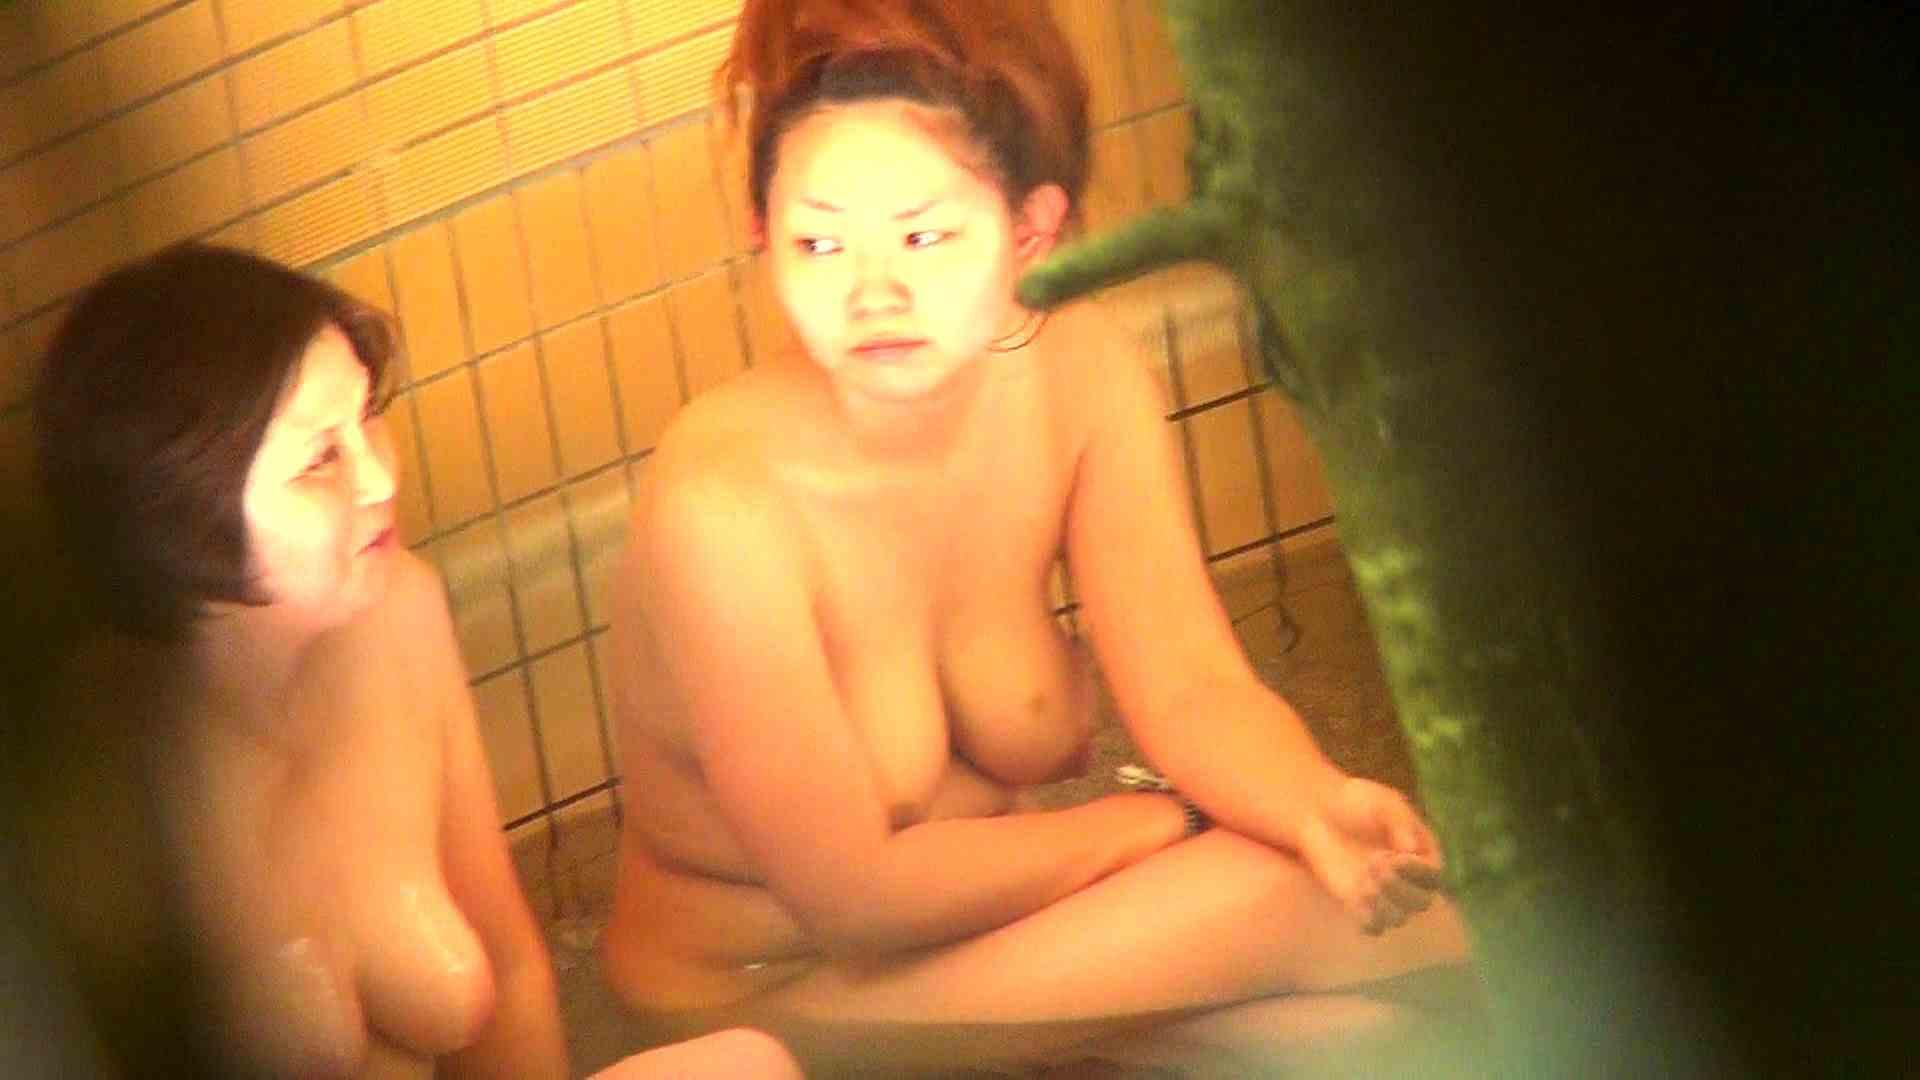 Aquaな露天風呂Vol.267 盗撮   HなOL  91pic 61